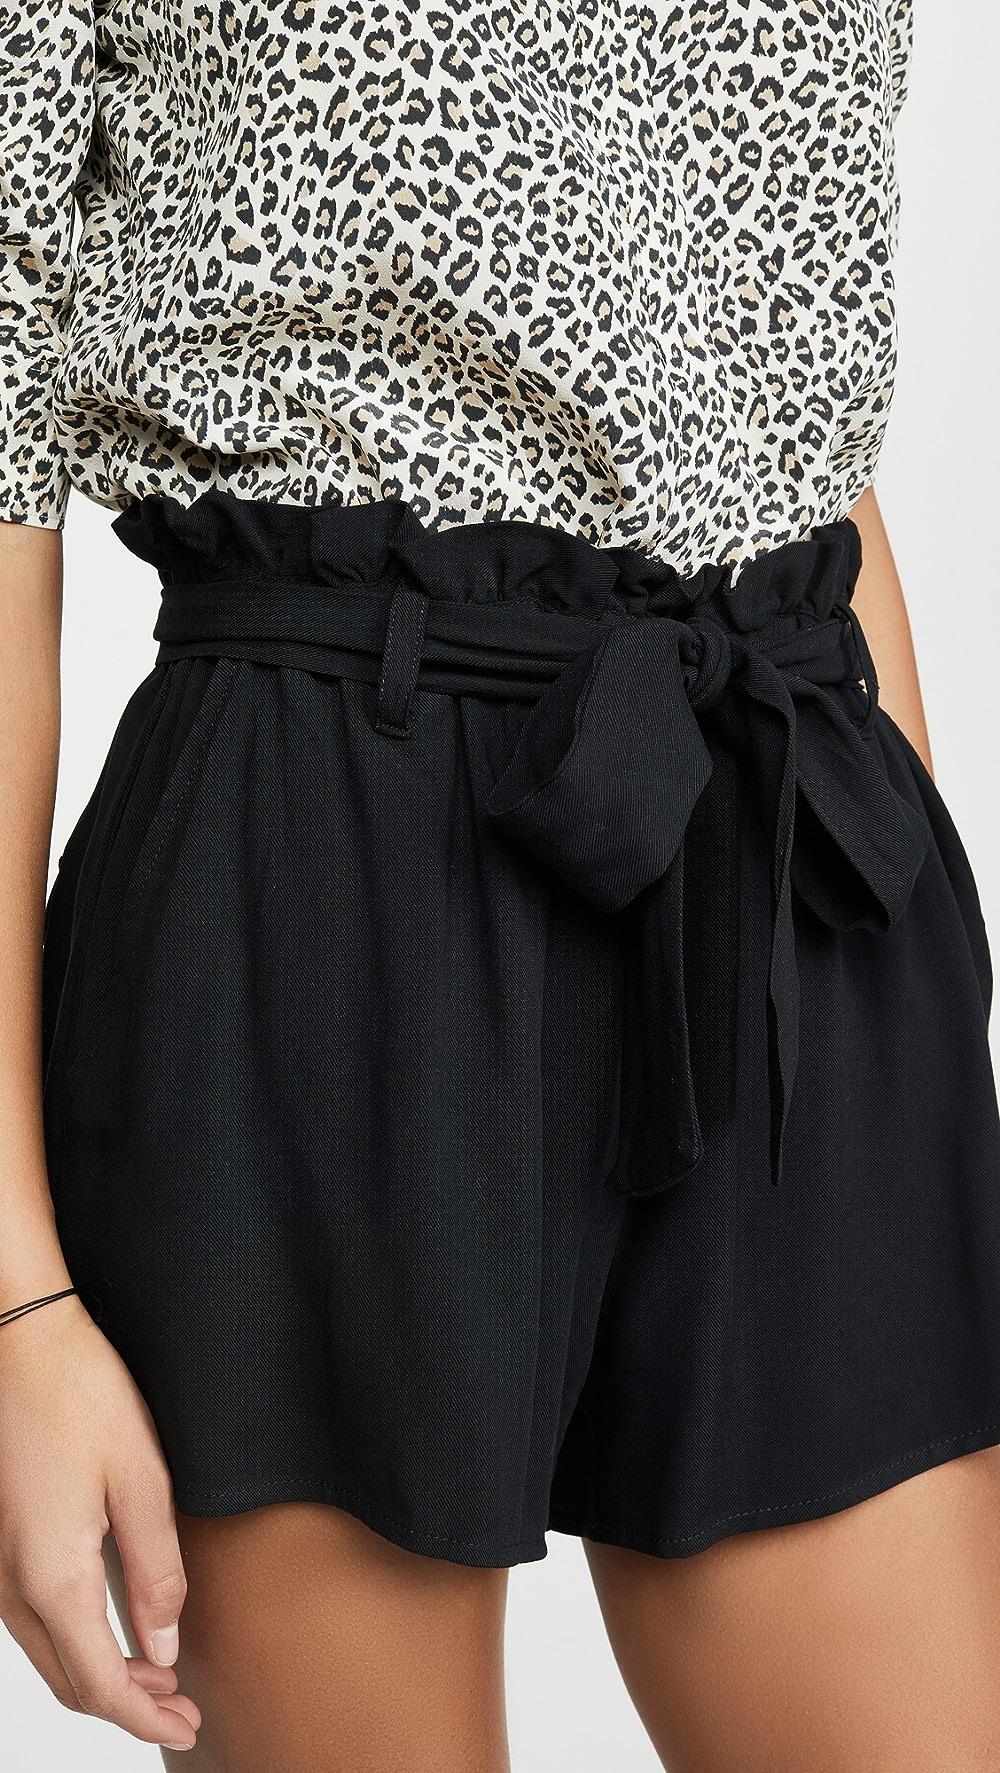 Amiable Bb Dakota - Jack By Bb Dakota Secure The Bag Shorts Online Discount